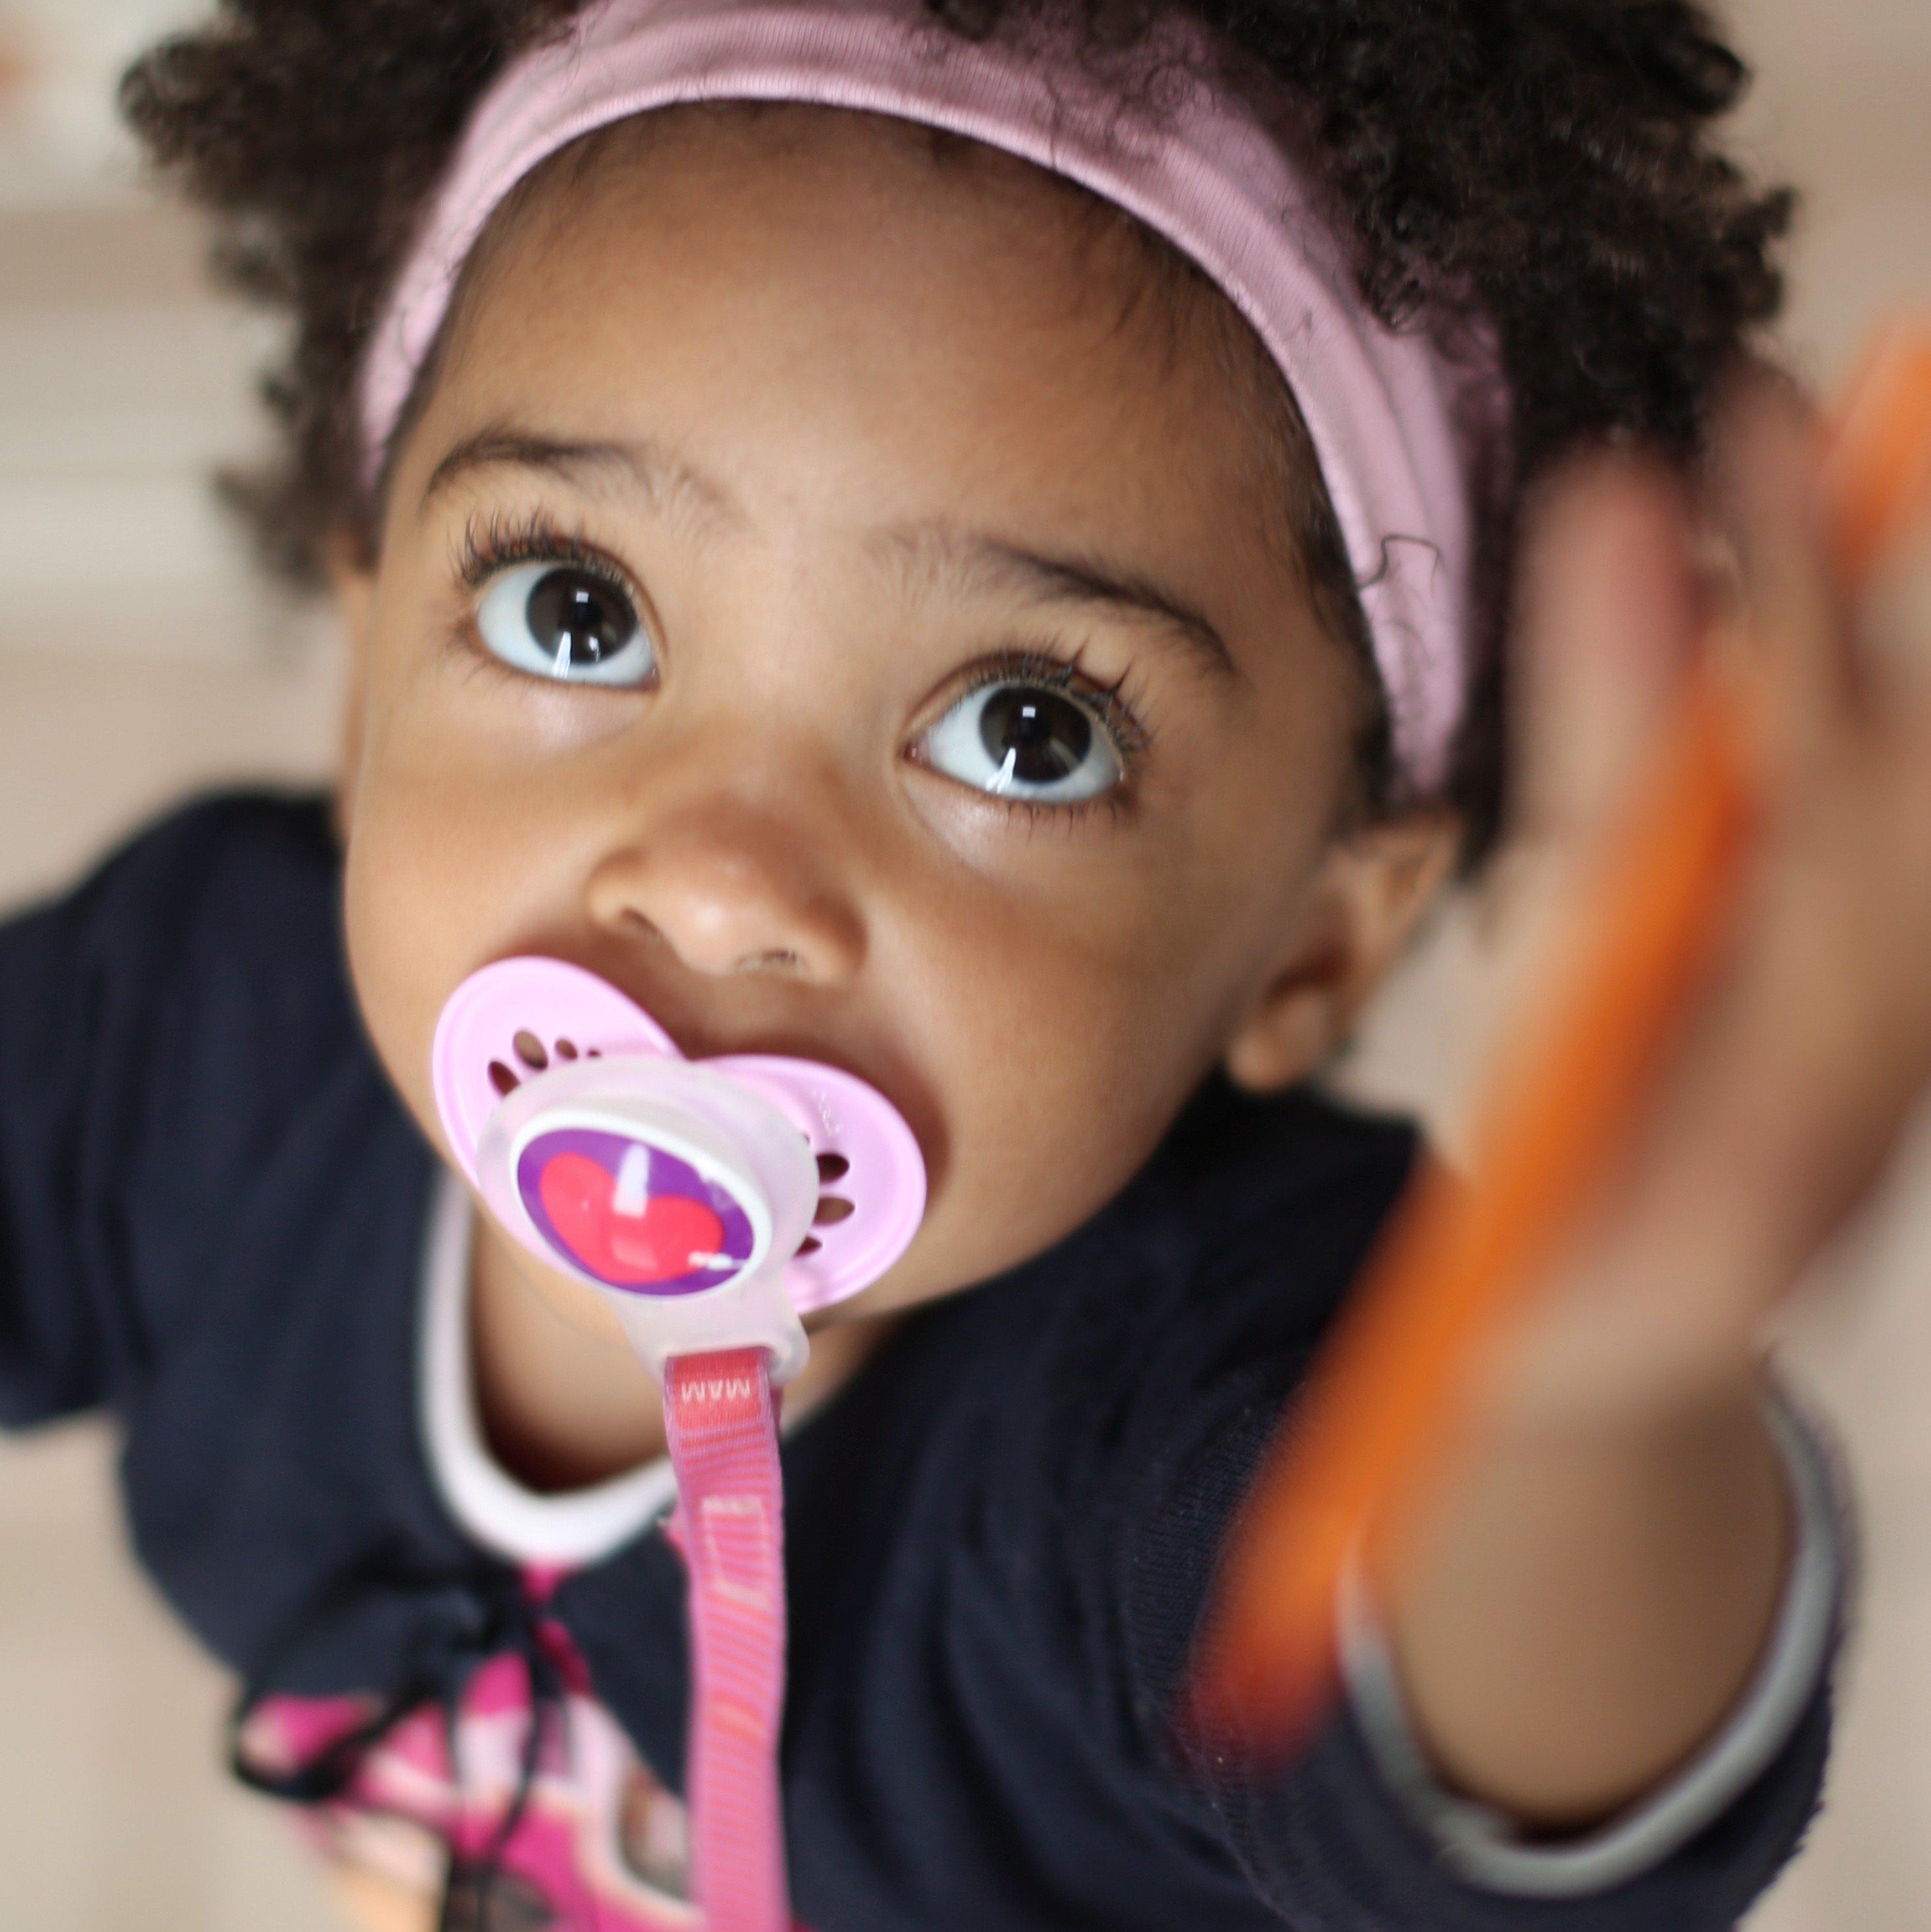 enter washingtonian's cutest baby contest | washingtonian